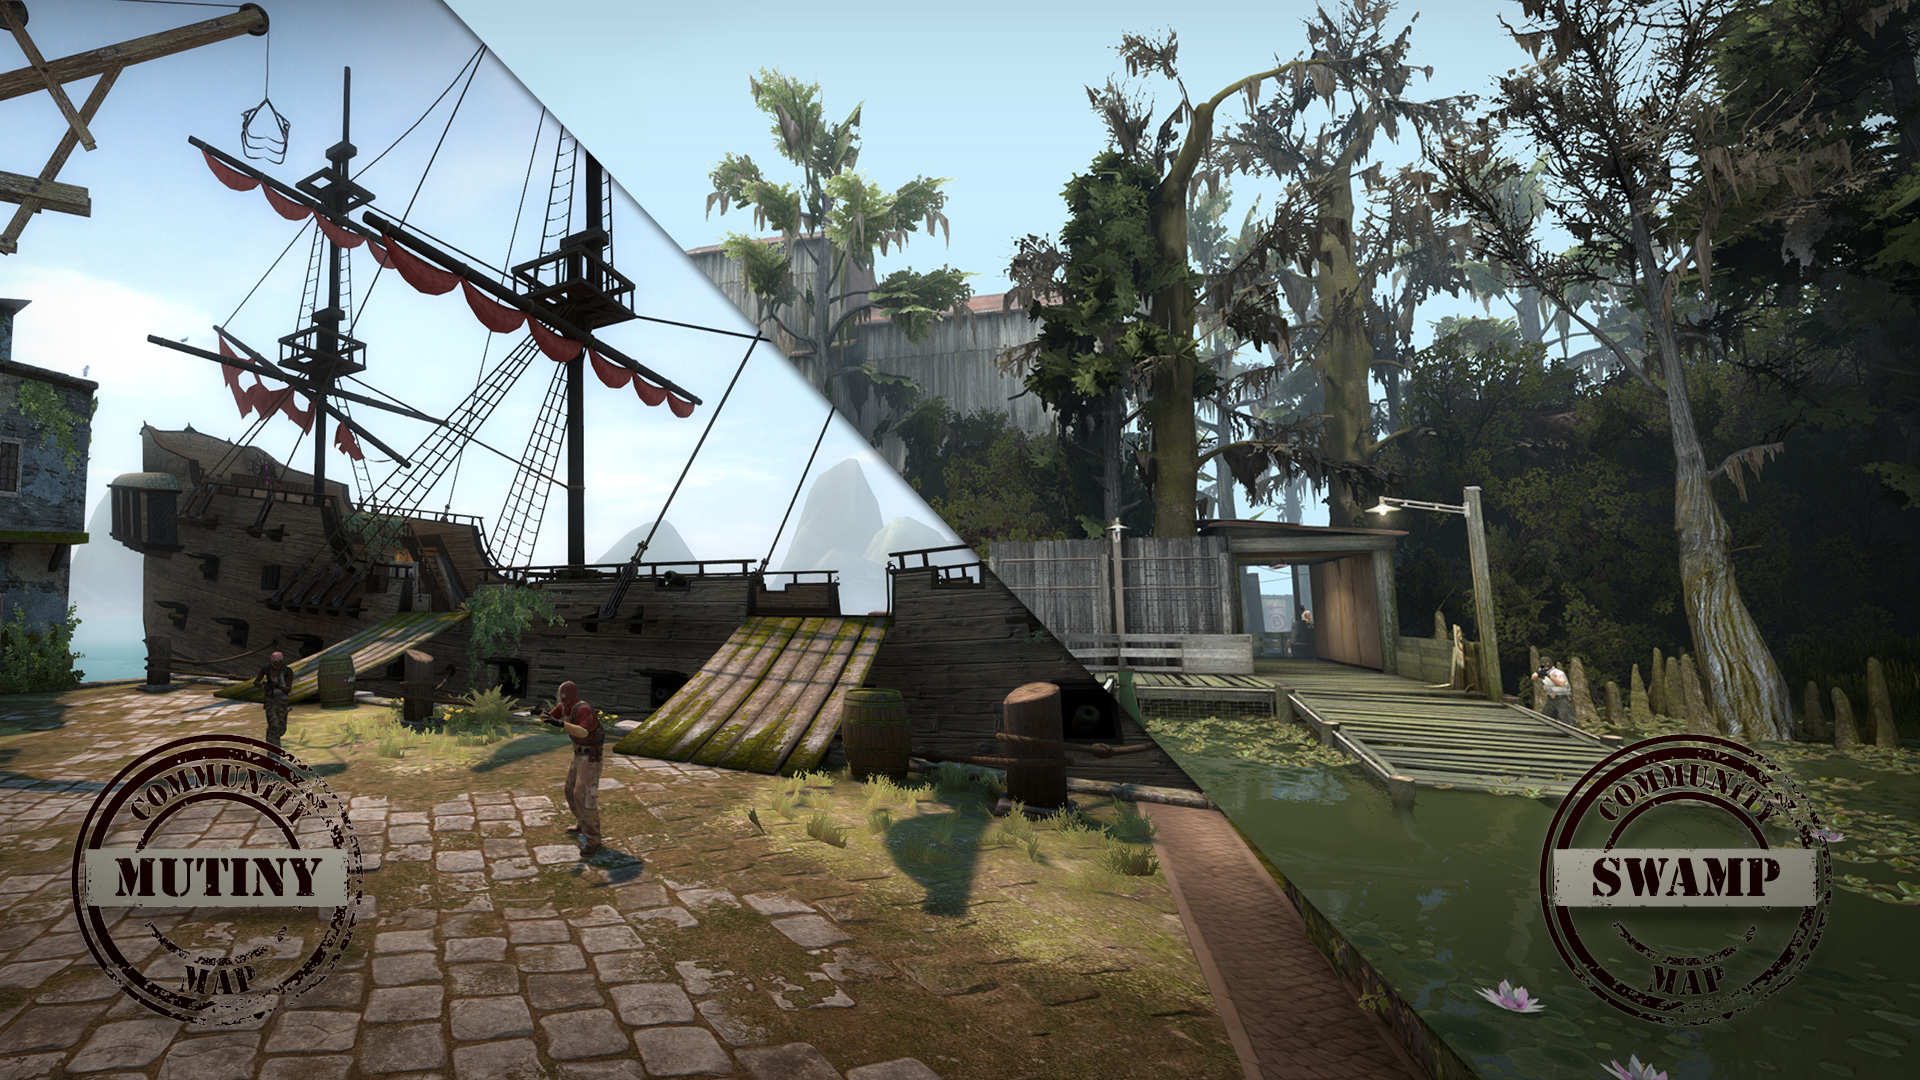 mutiny_swamp.jpg